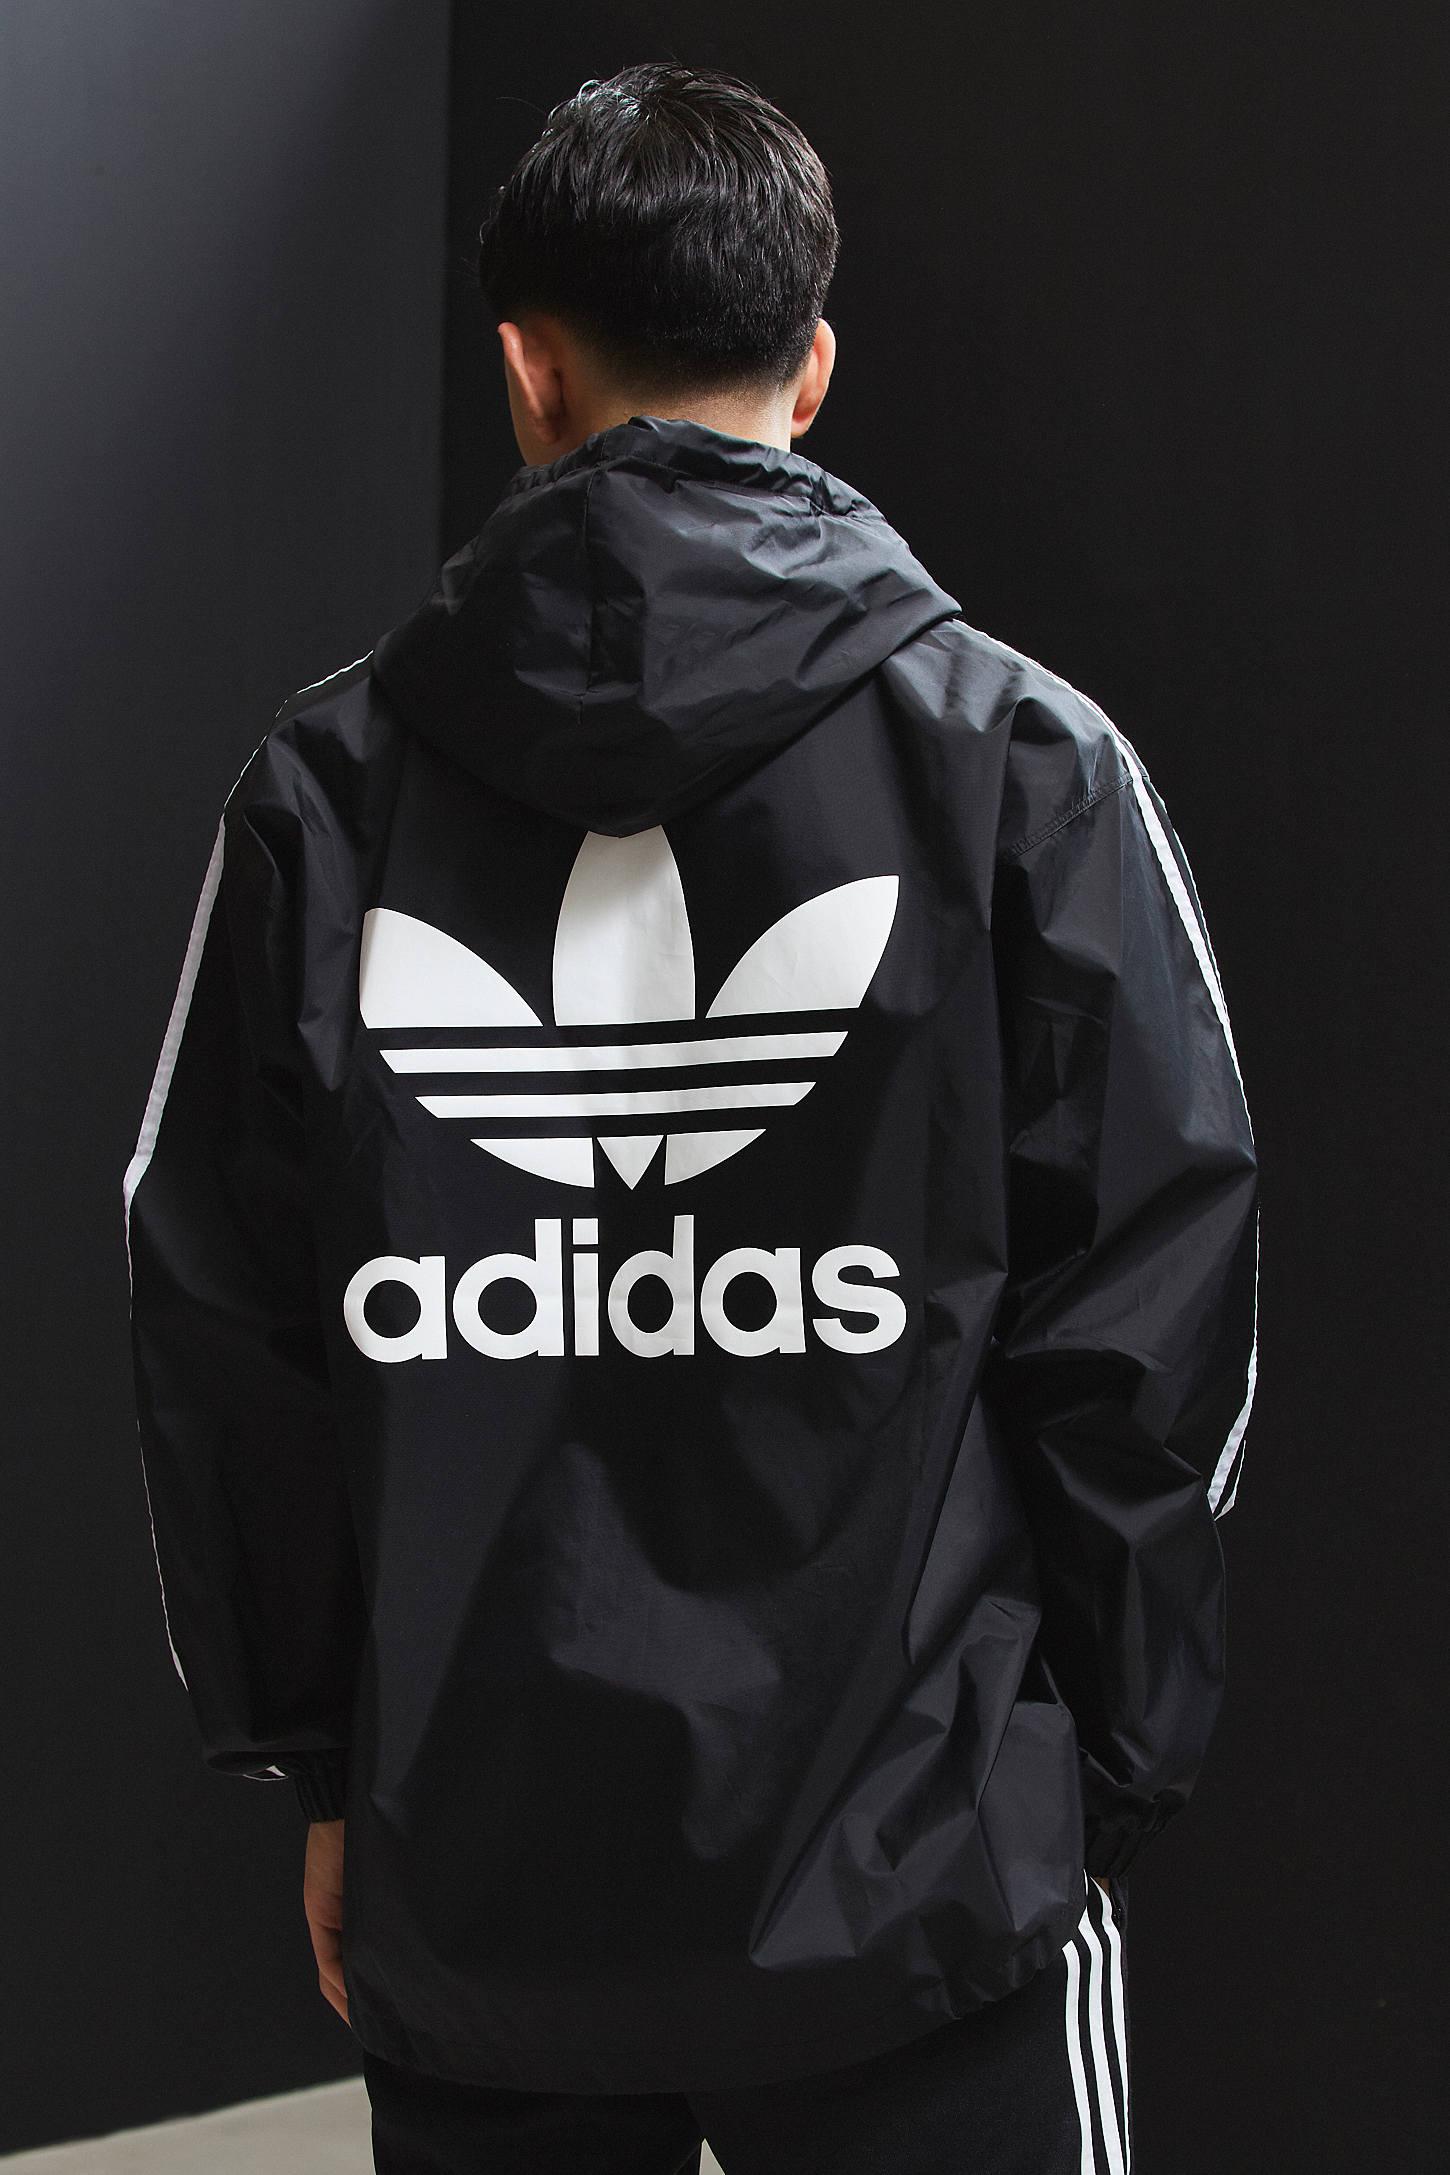 Adidas Eskimo Giacca Urban Outfitters